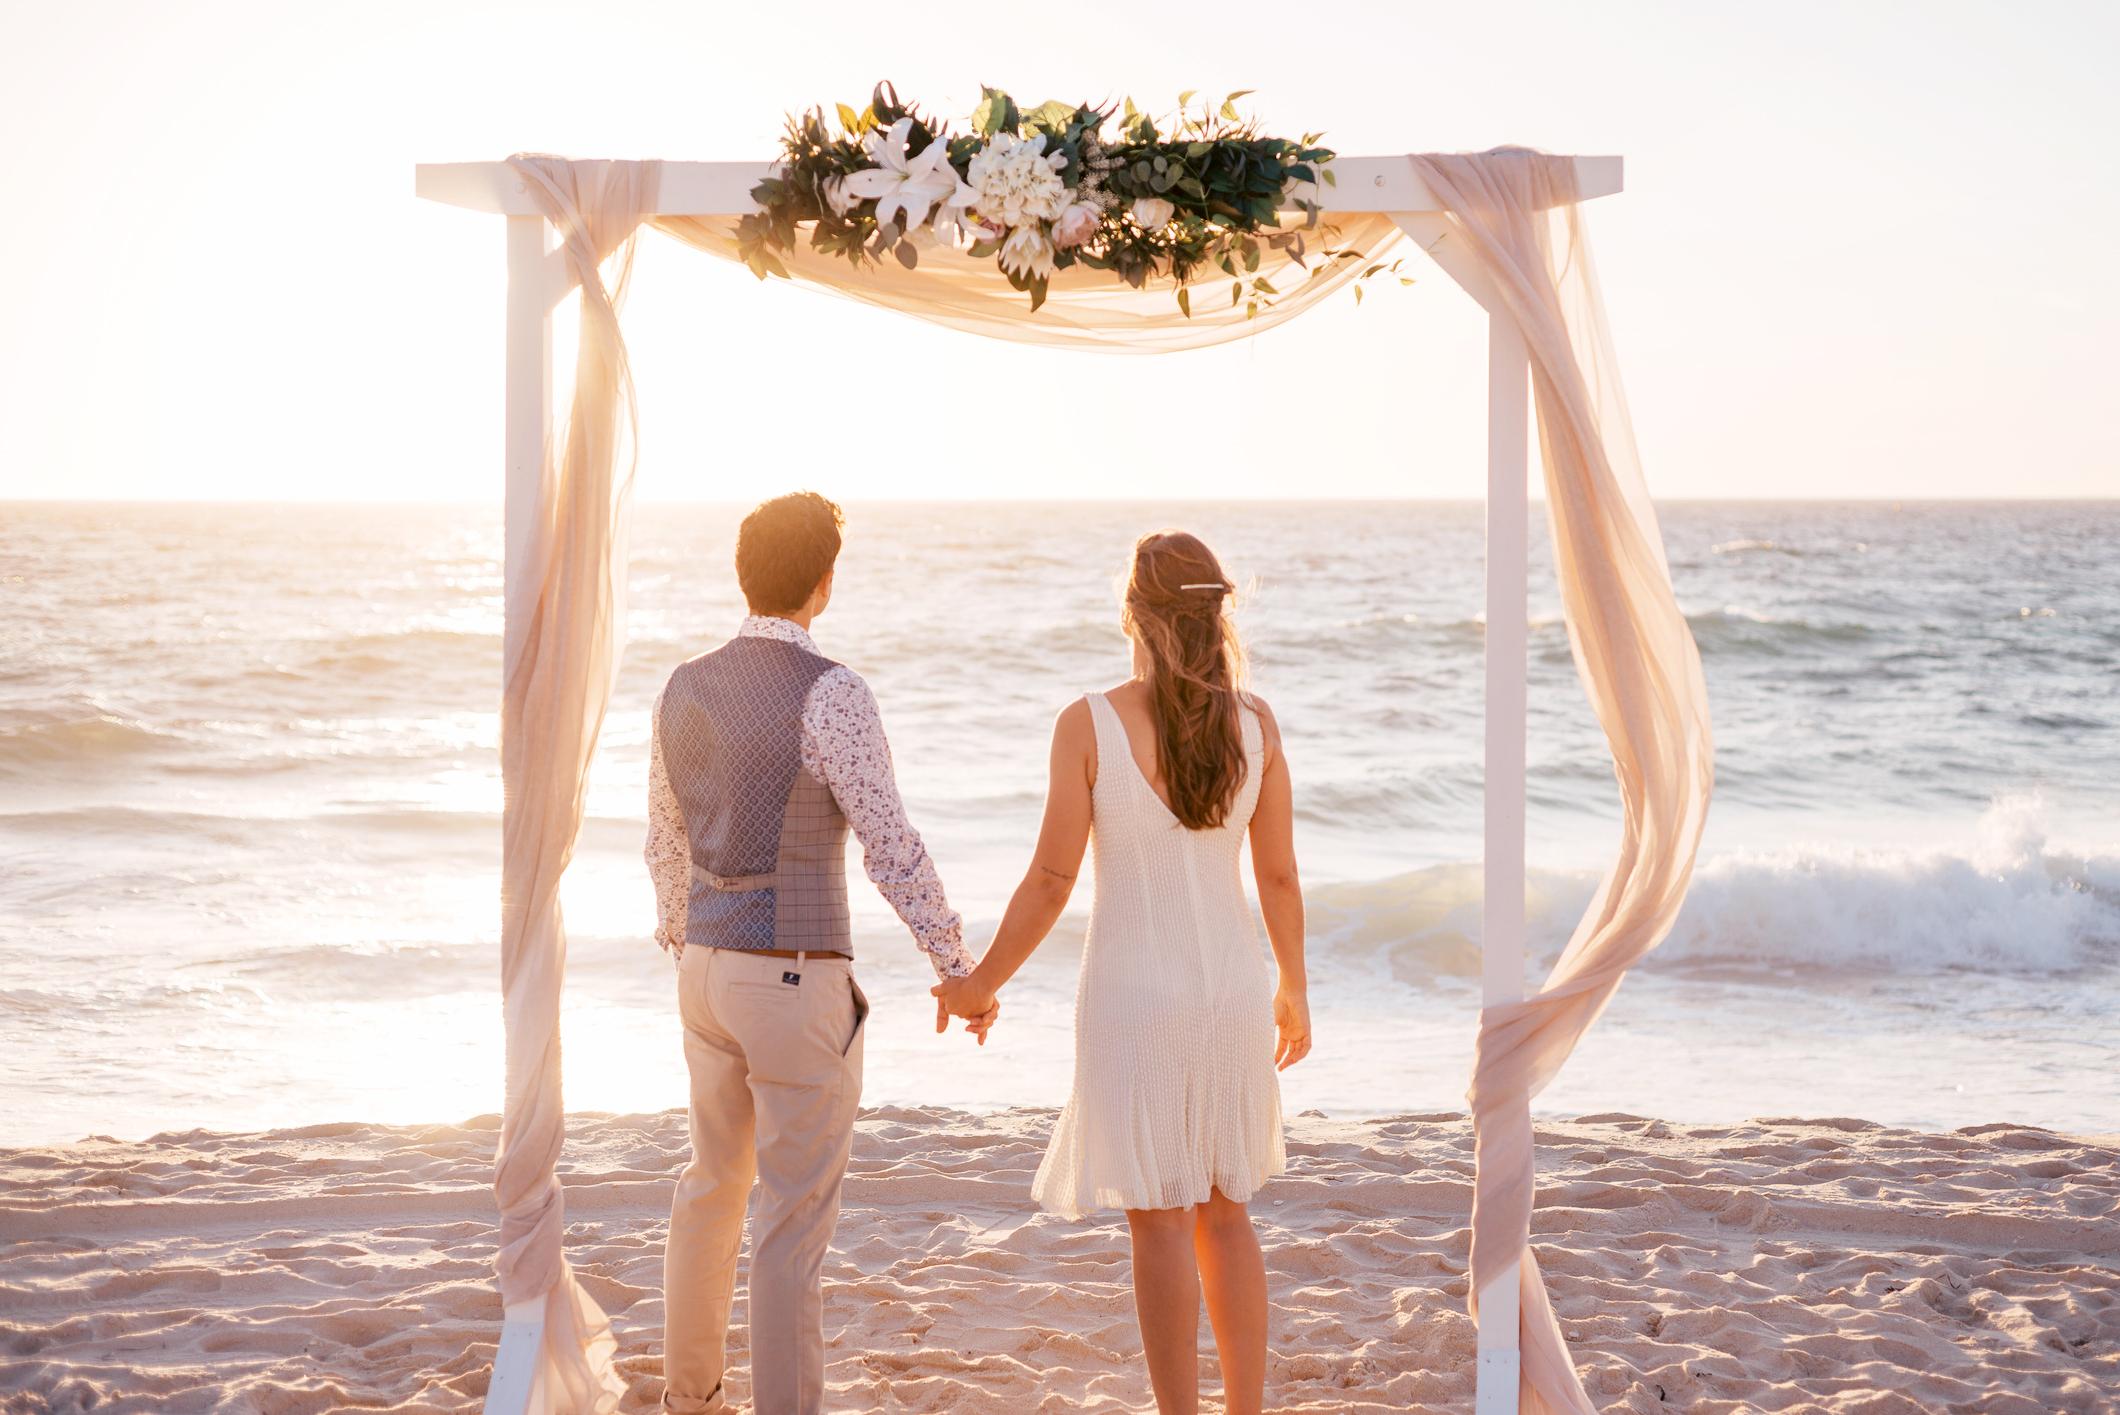 Ideas For Decorating A Wedding Arch Lovetoknow